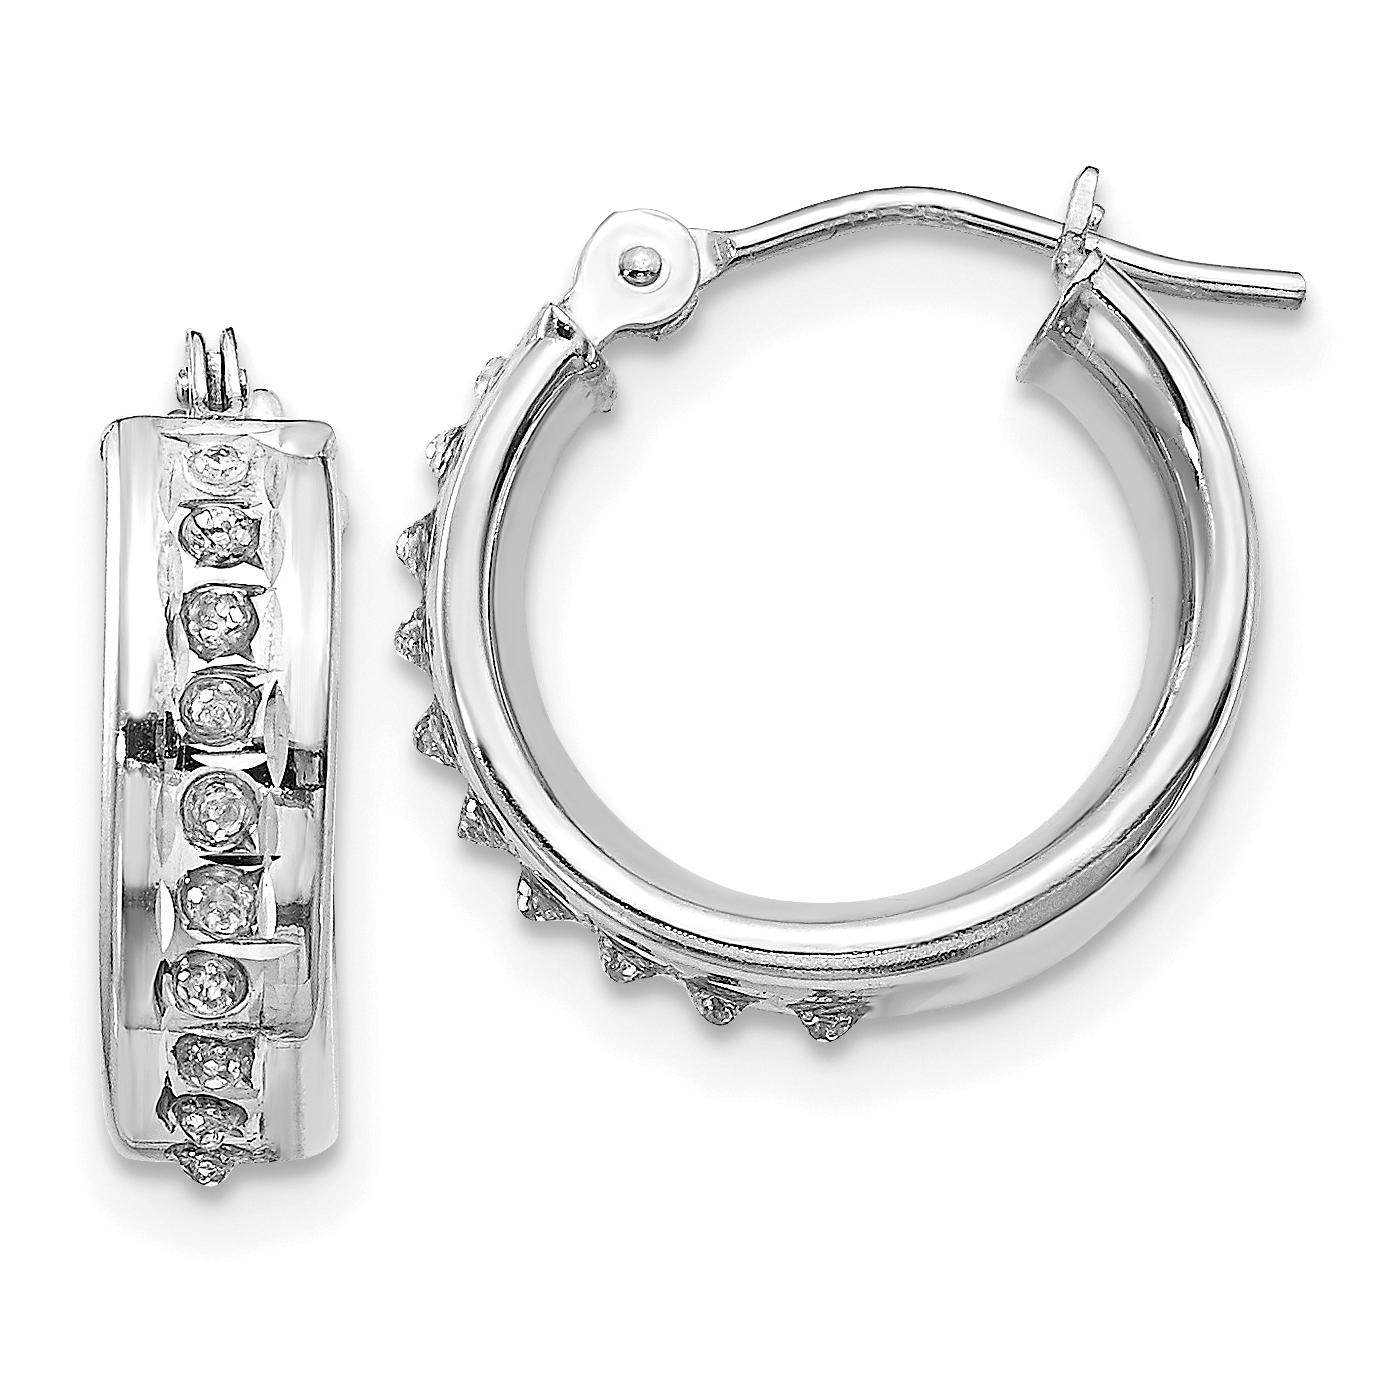 783babe23fd79 14k White Gold Diamond Fascination Round Hinged Hoop Earrings